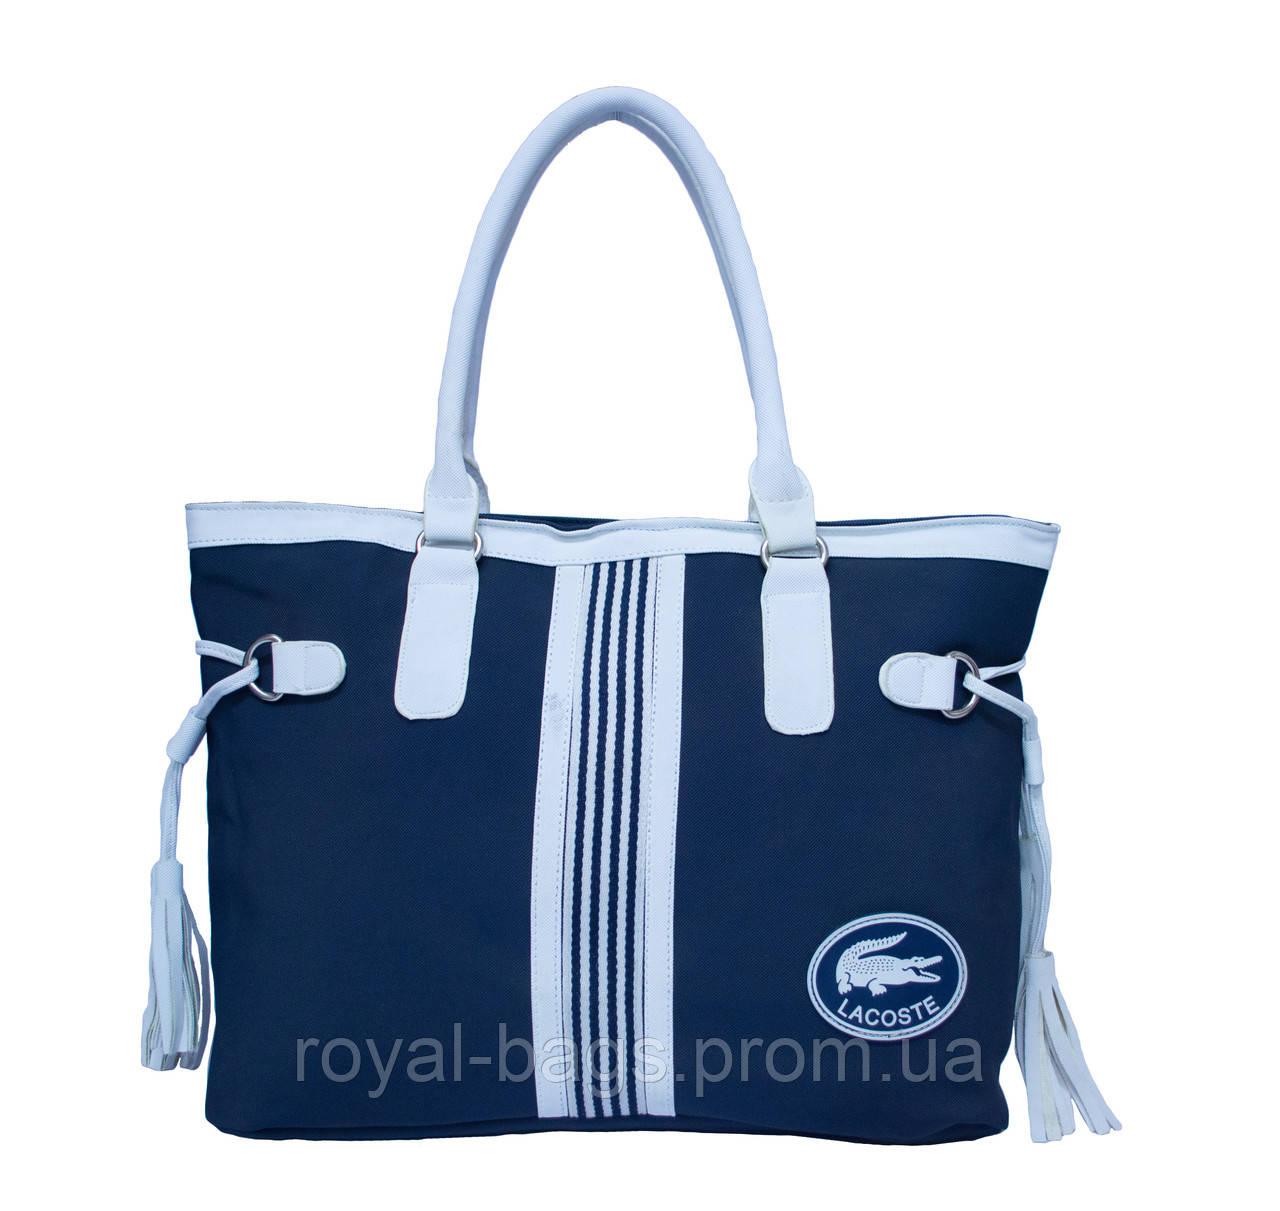 Сумка Lacoste Nelly Shopping синяя